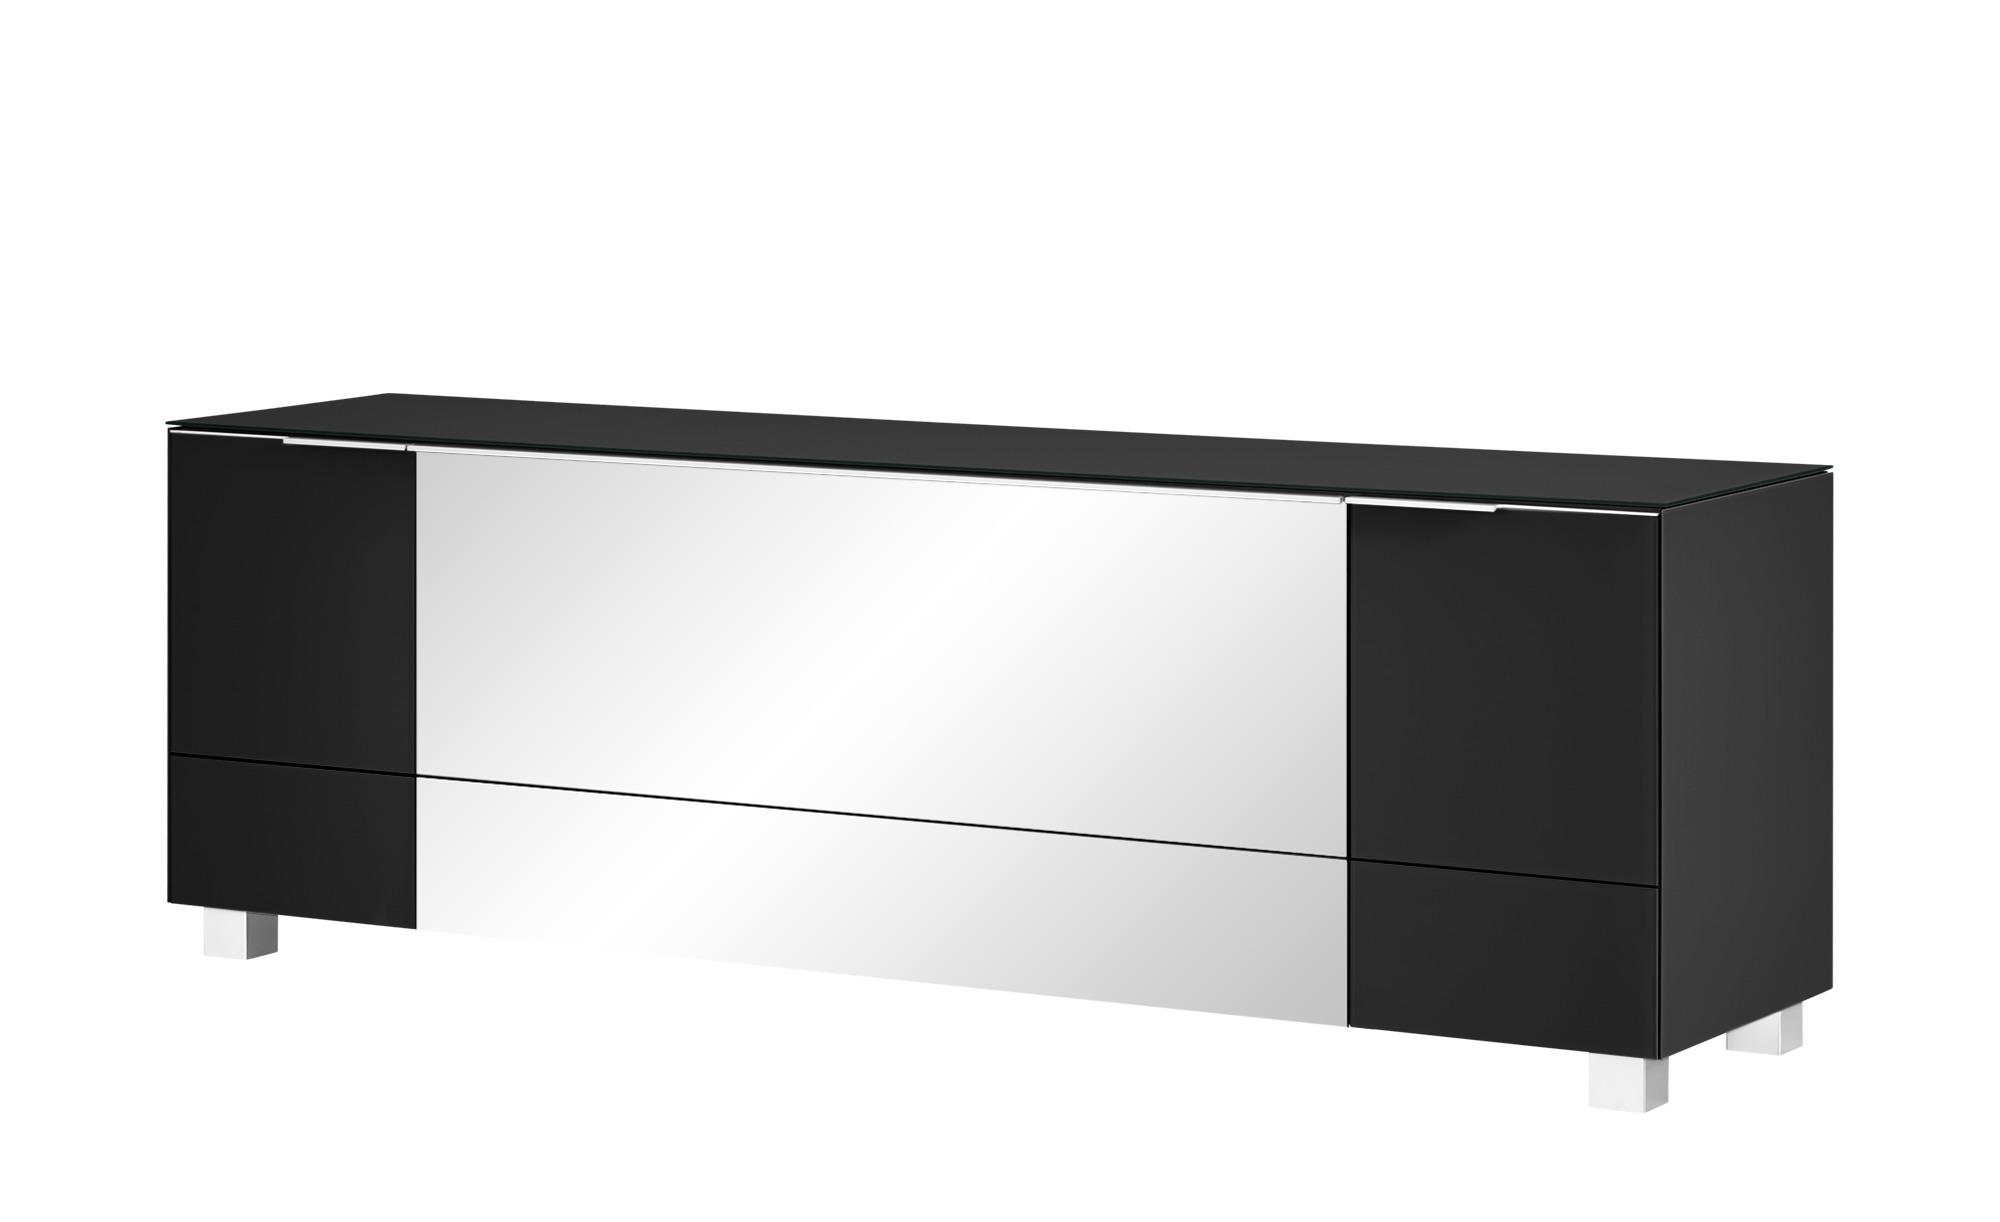 TV-Lowboard  Soundbase L ¦ schwarz ¦ Maße (cm): B: 180 H: 60 T: 42 TV- & Media Möbel > TV-Racks - Höffner